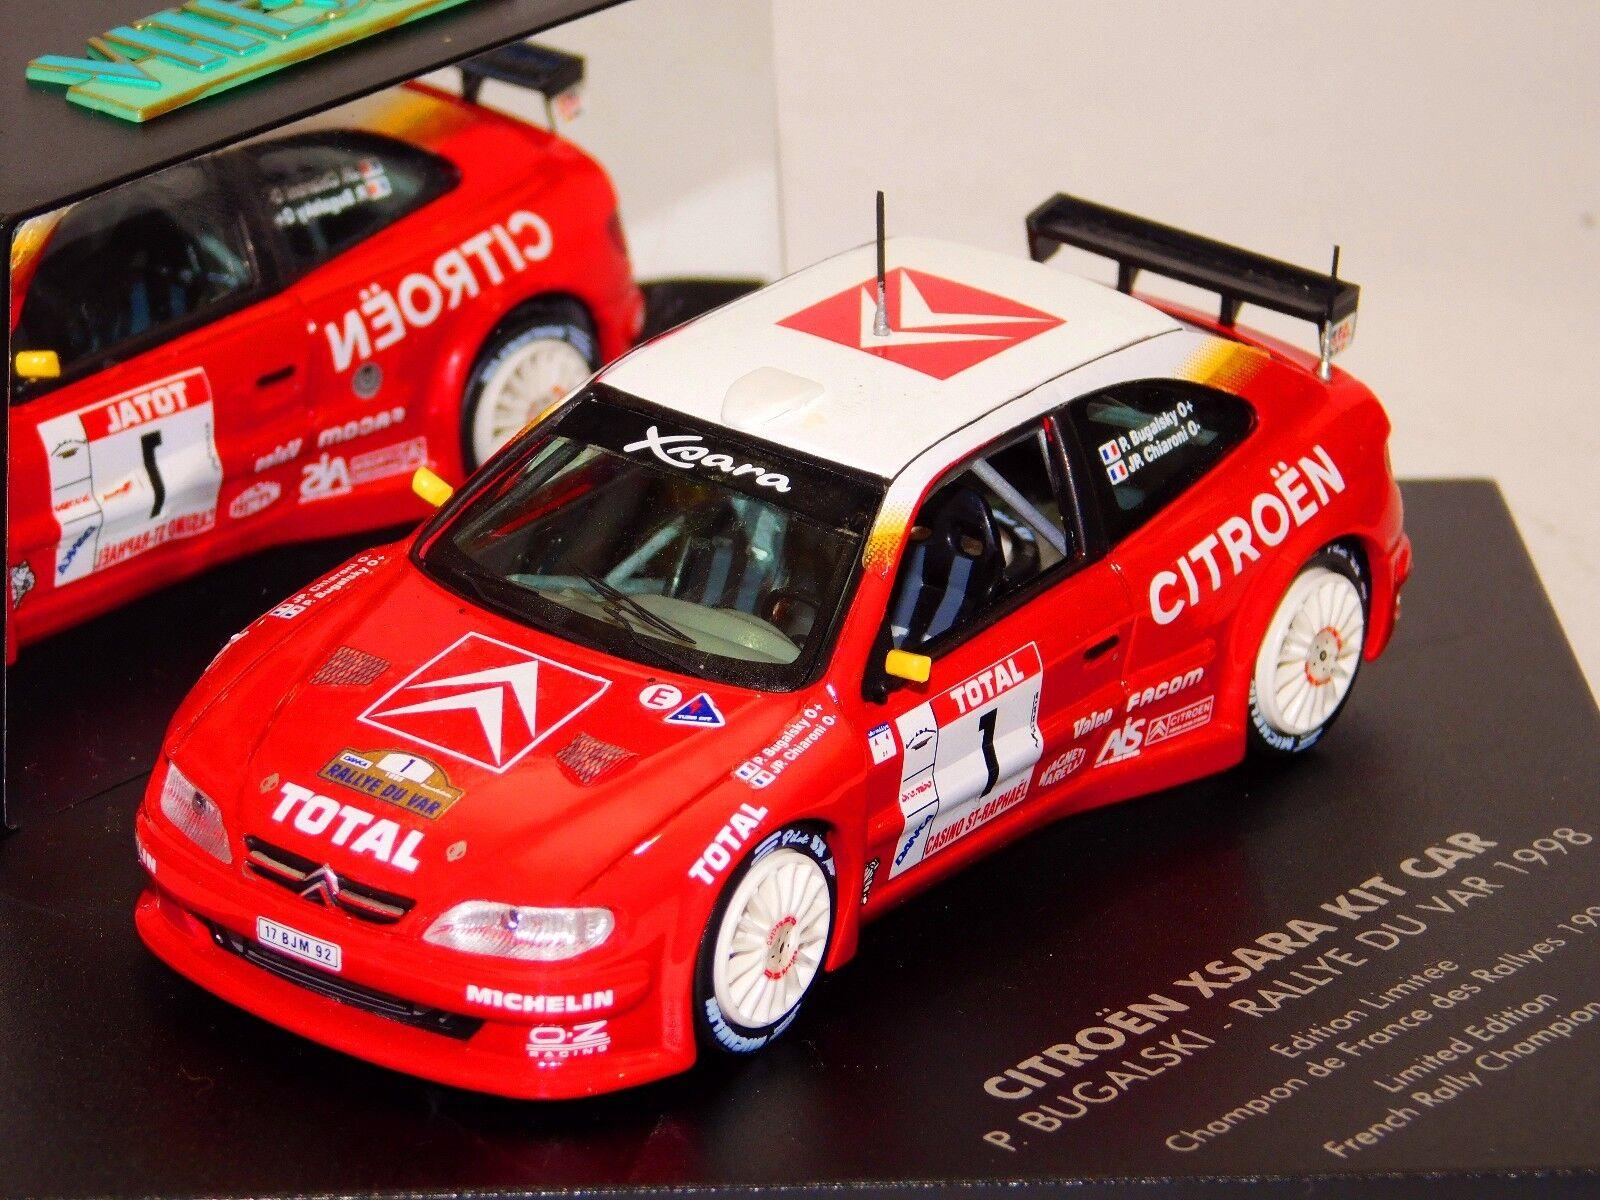 el mas de moda CITROEN Xsara Kit Coche  1 Rally du Var Var Var 1998 campeón de Bugalski Skid V98208 1 43  descuento